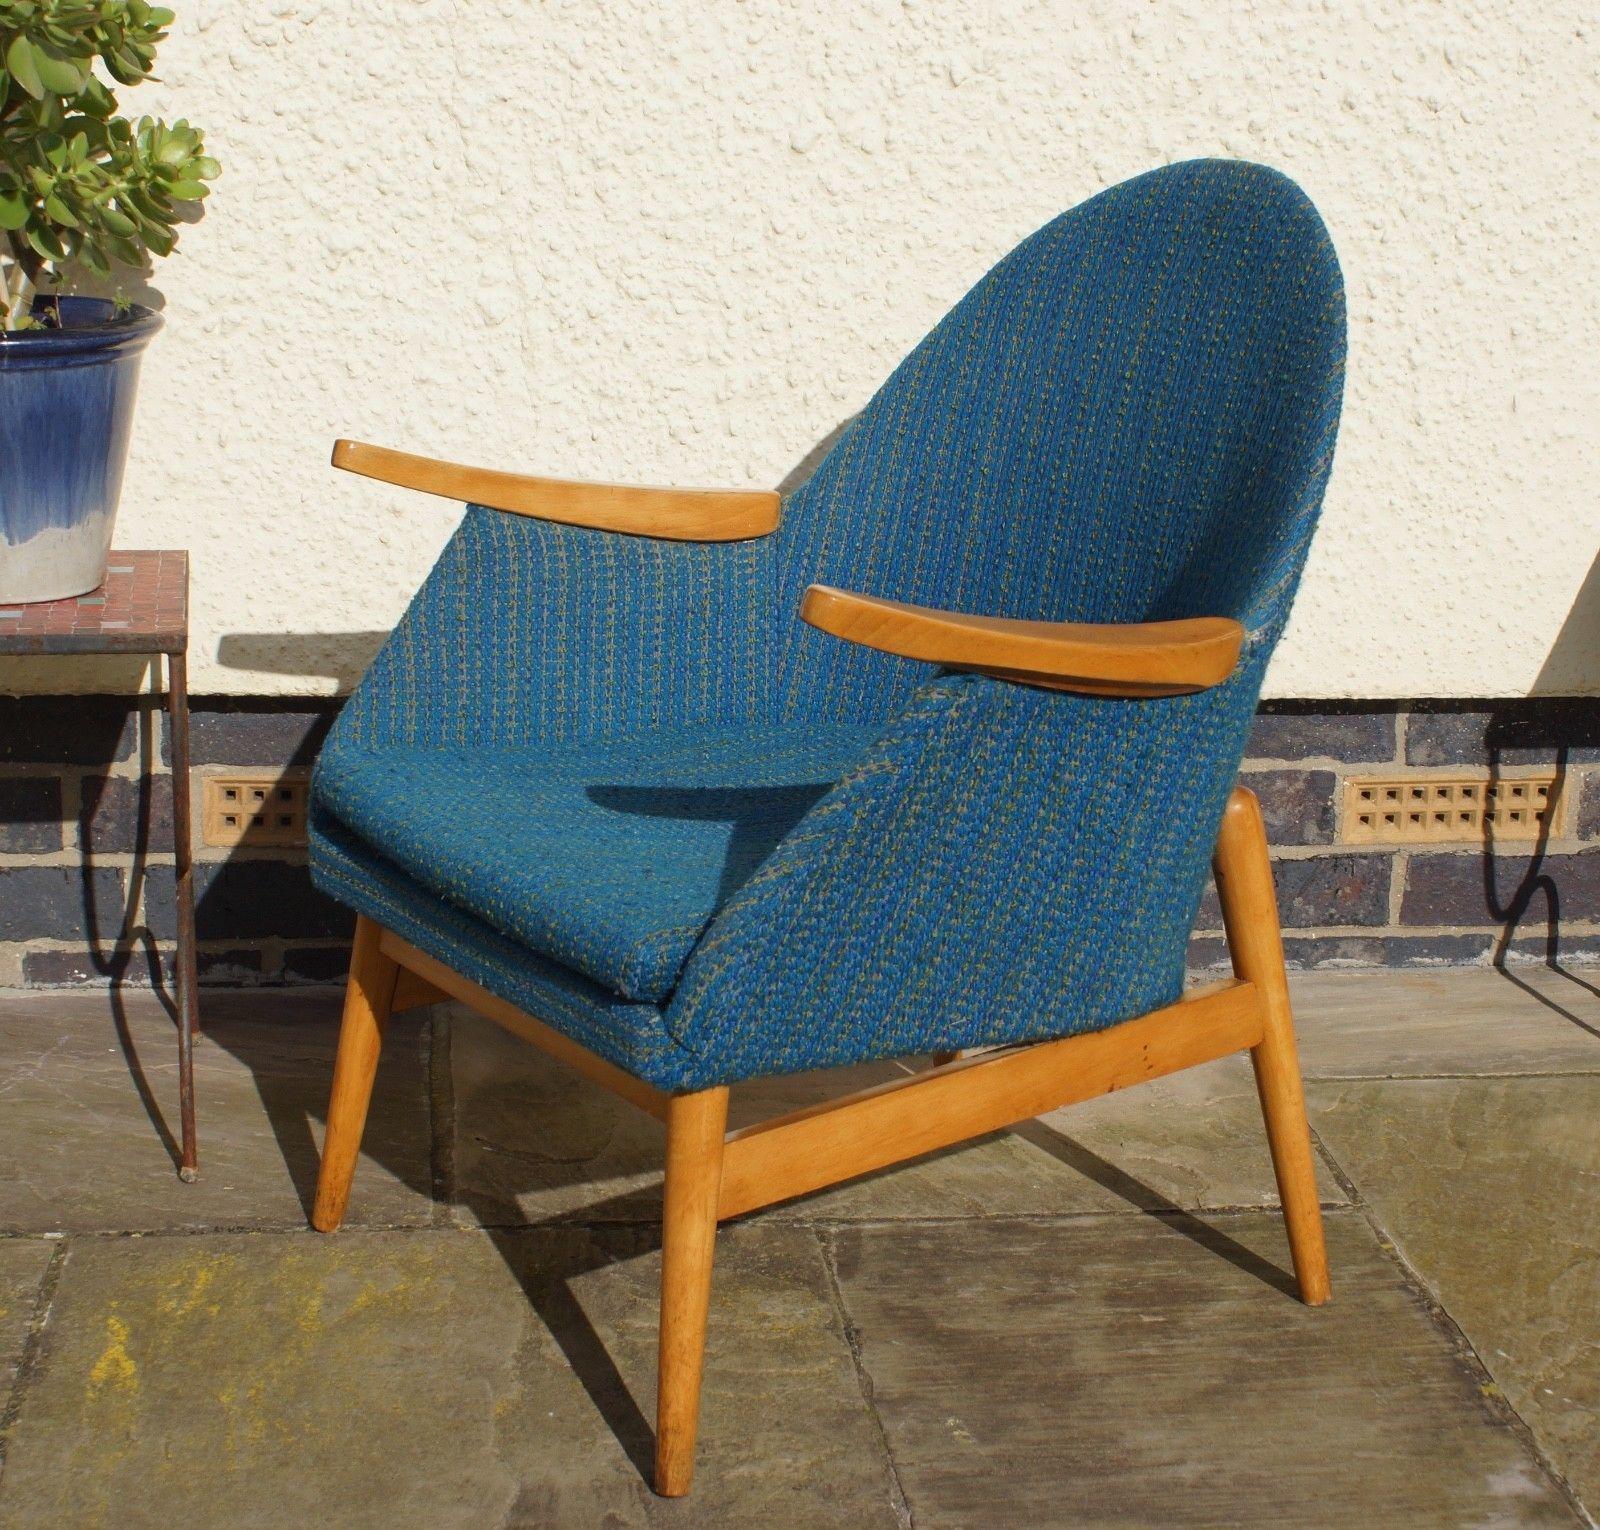 About A Chair 22 Armchair.Single Mid Century Modern Lounge Armchair Chair Circa 1965 Jan18 22